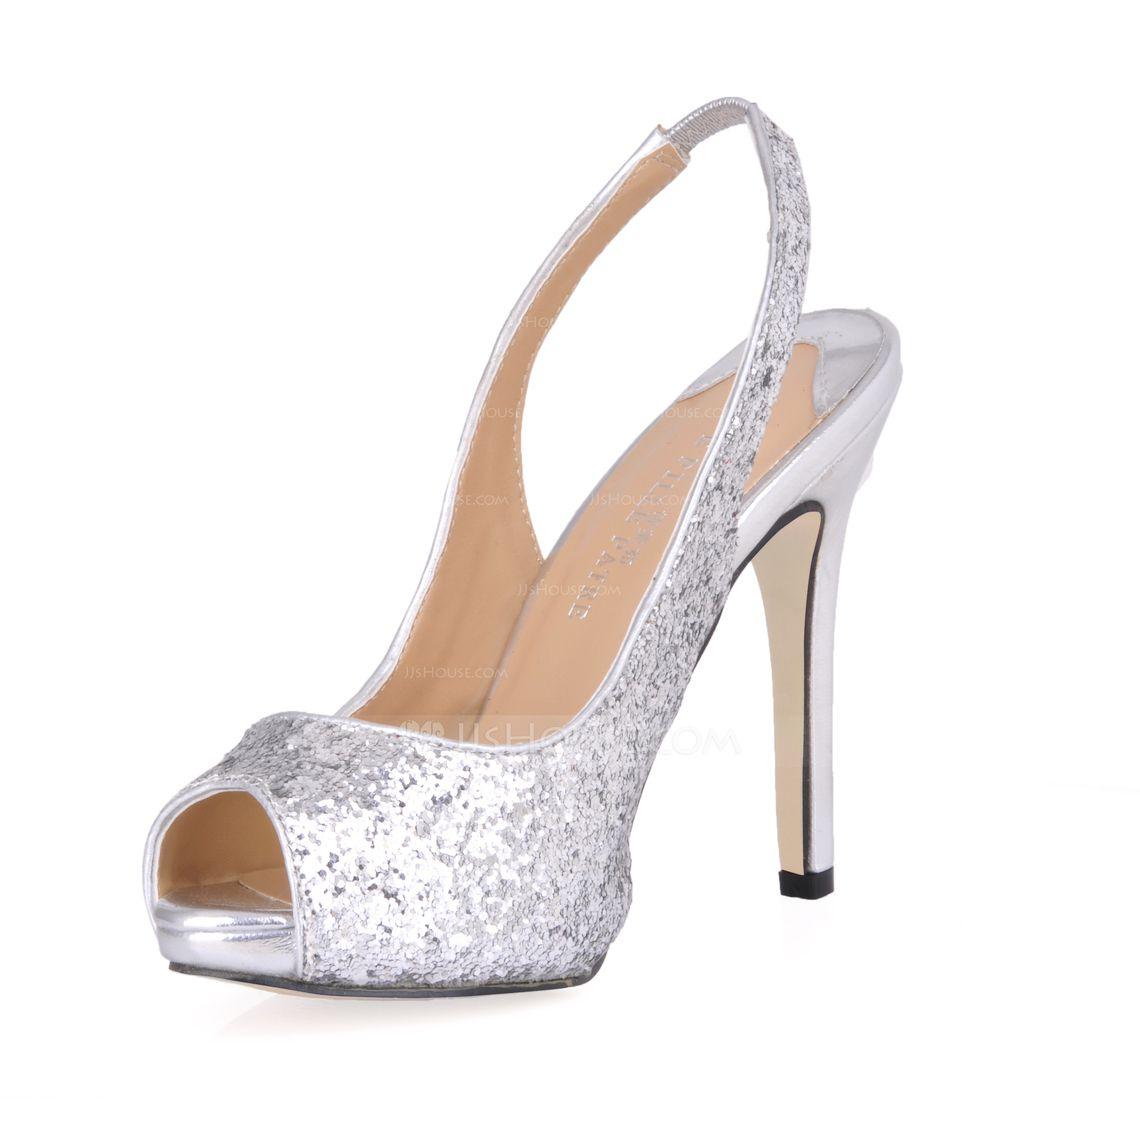 Women's Peep Toe Sandals Slingbacks Stiletto Heel Sparkling Glitter Sequin Wedding Shoes